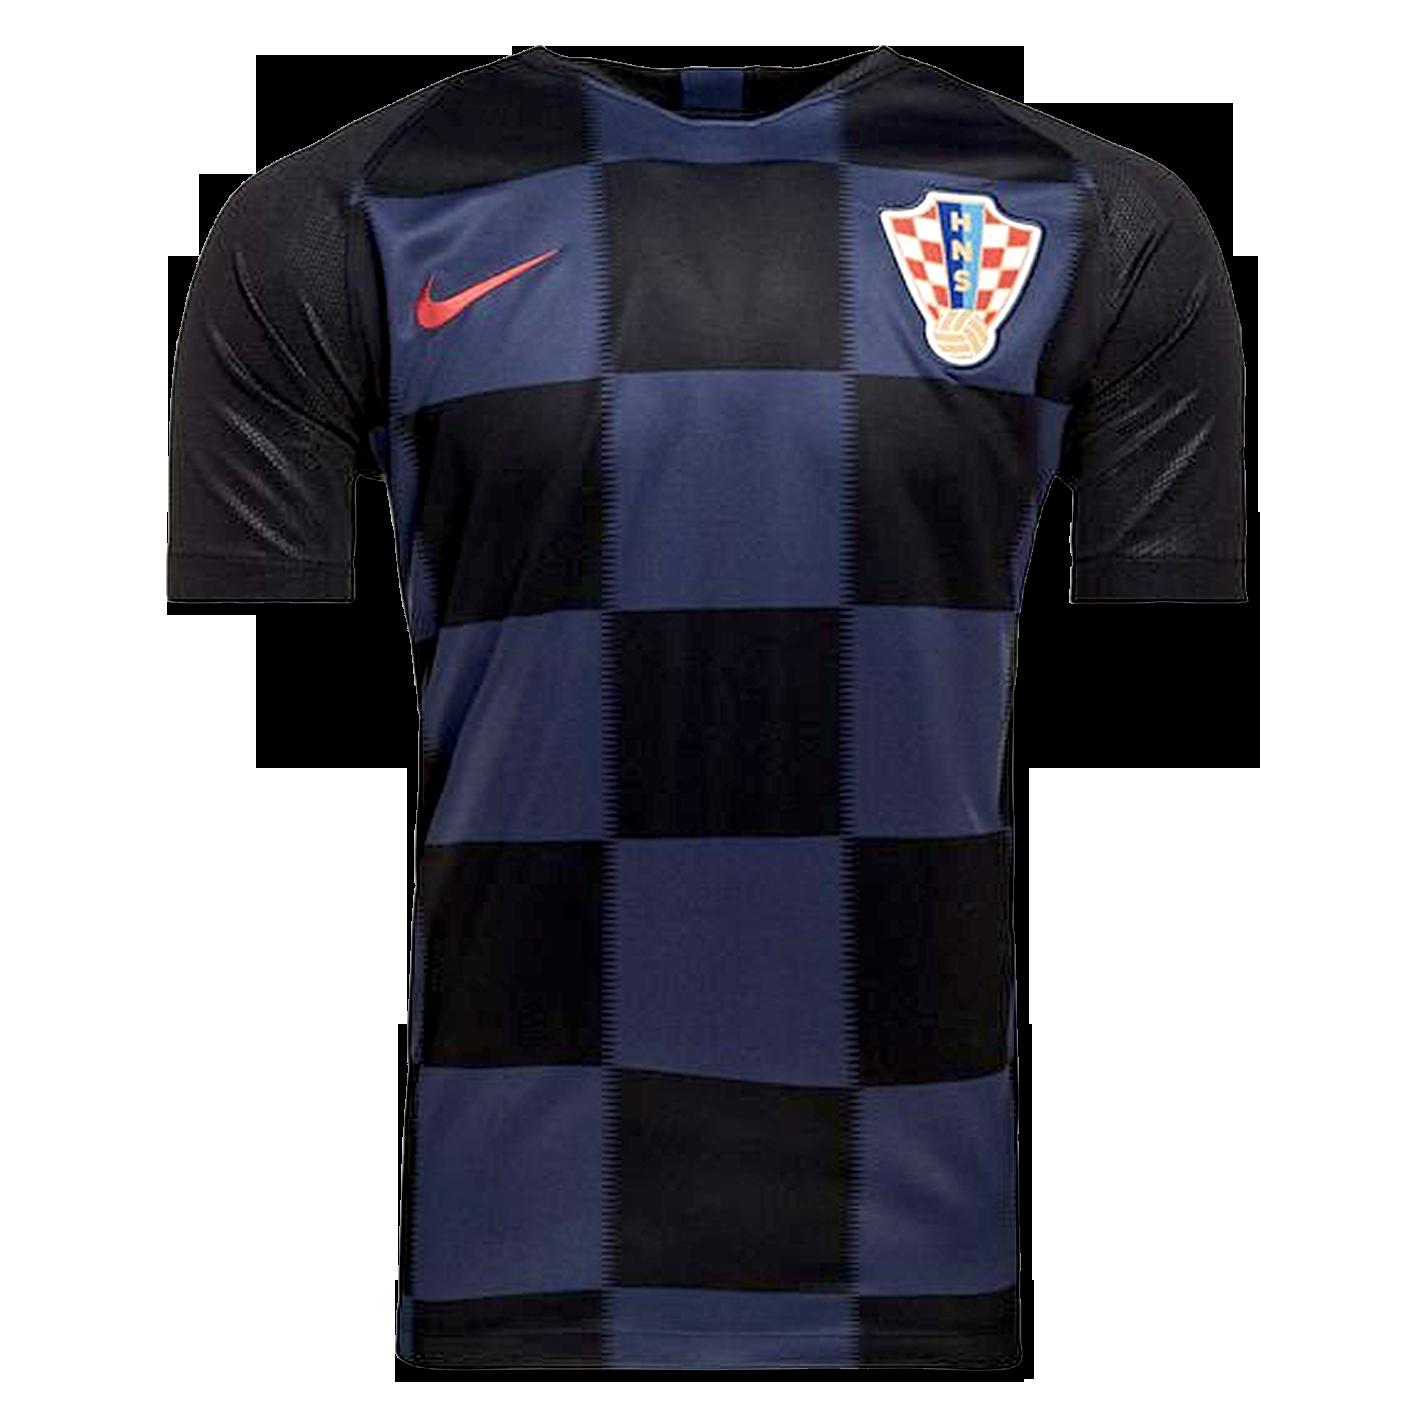 Croacia 2019 Jersey Away Usa Soccer Women France World Cup Jersey Football Shirts